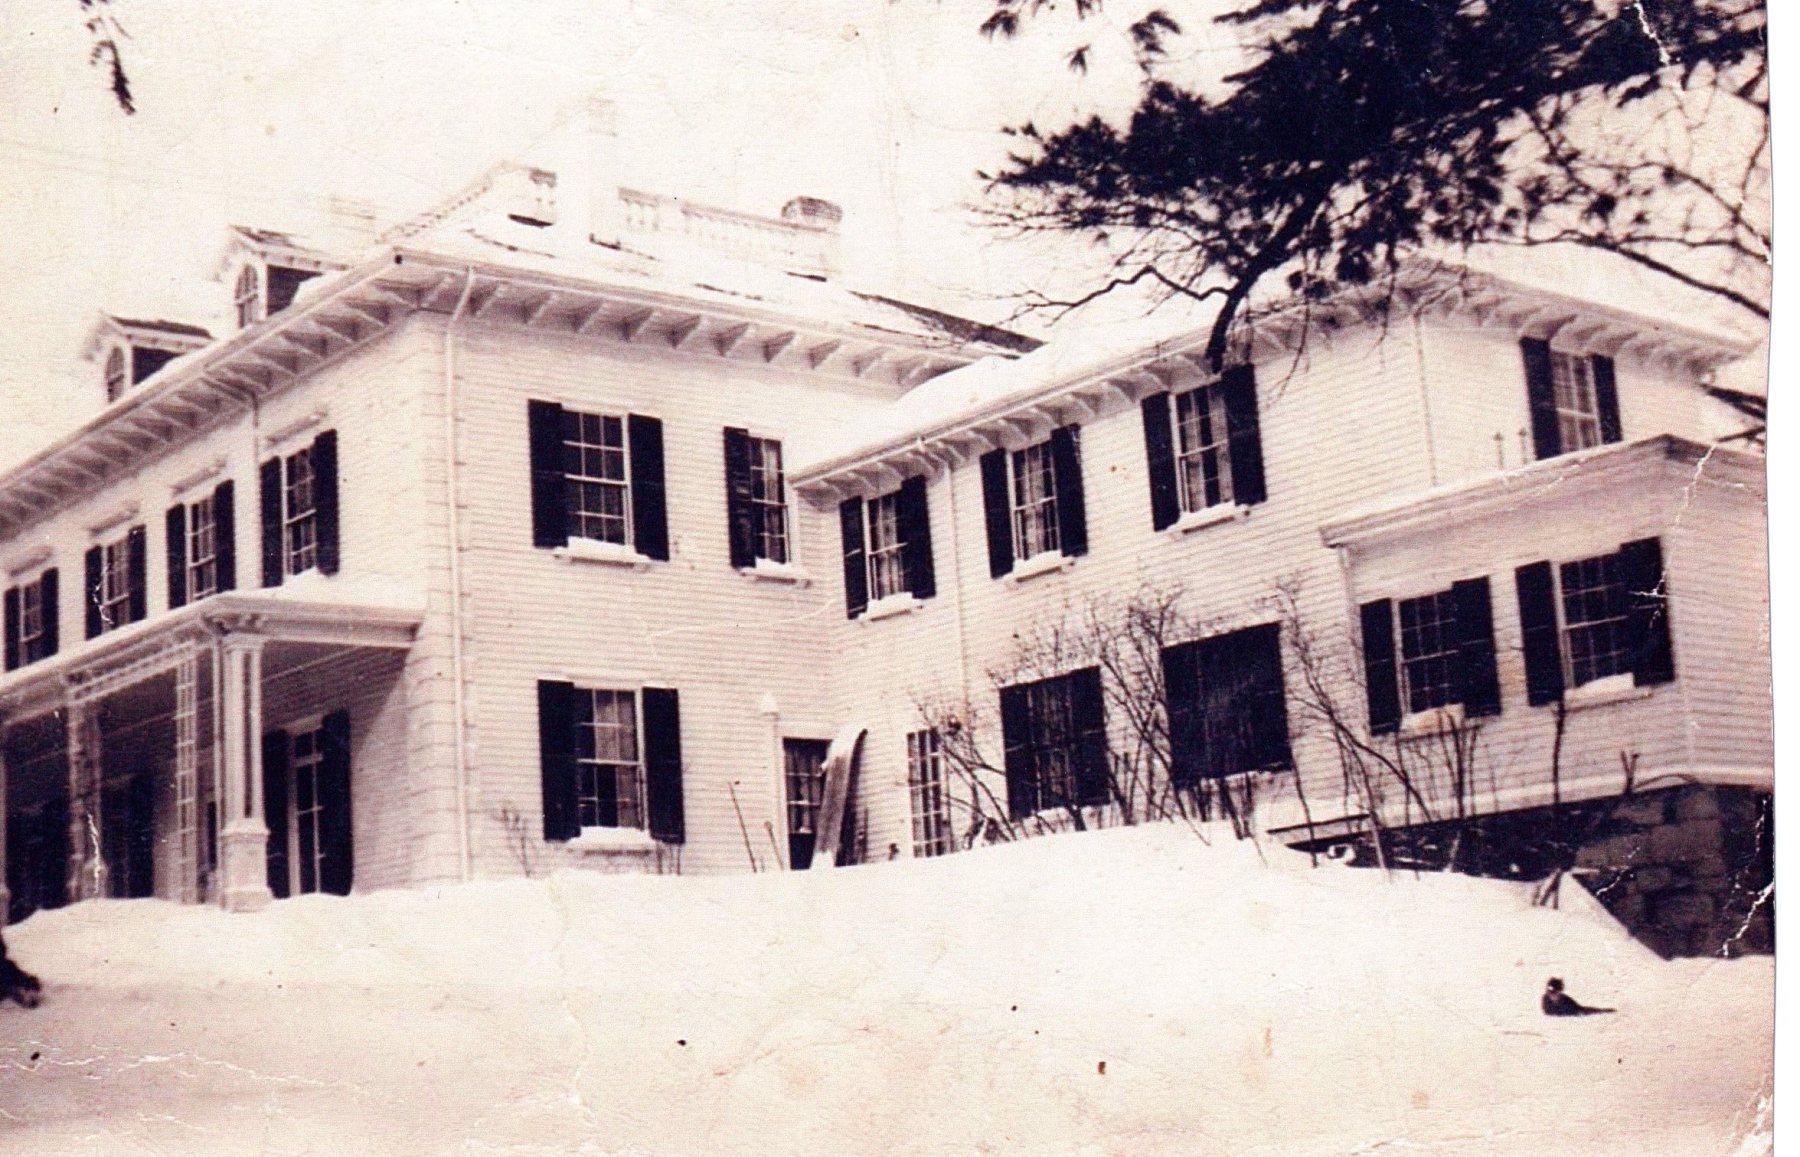 Frothingham/Rupprecht house 1949